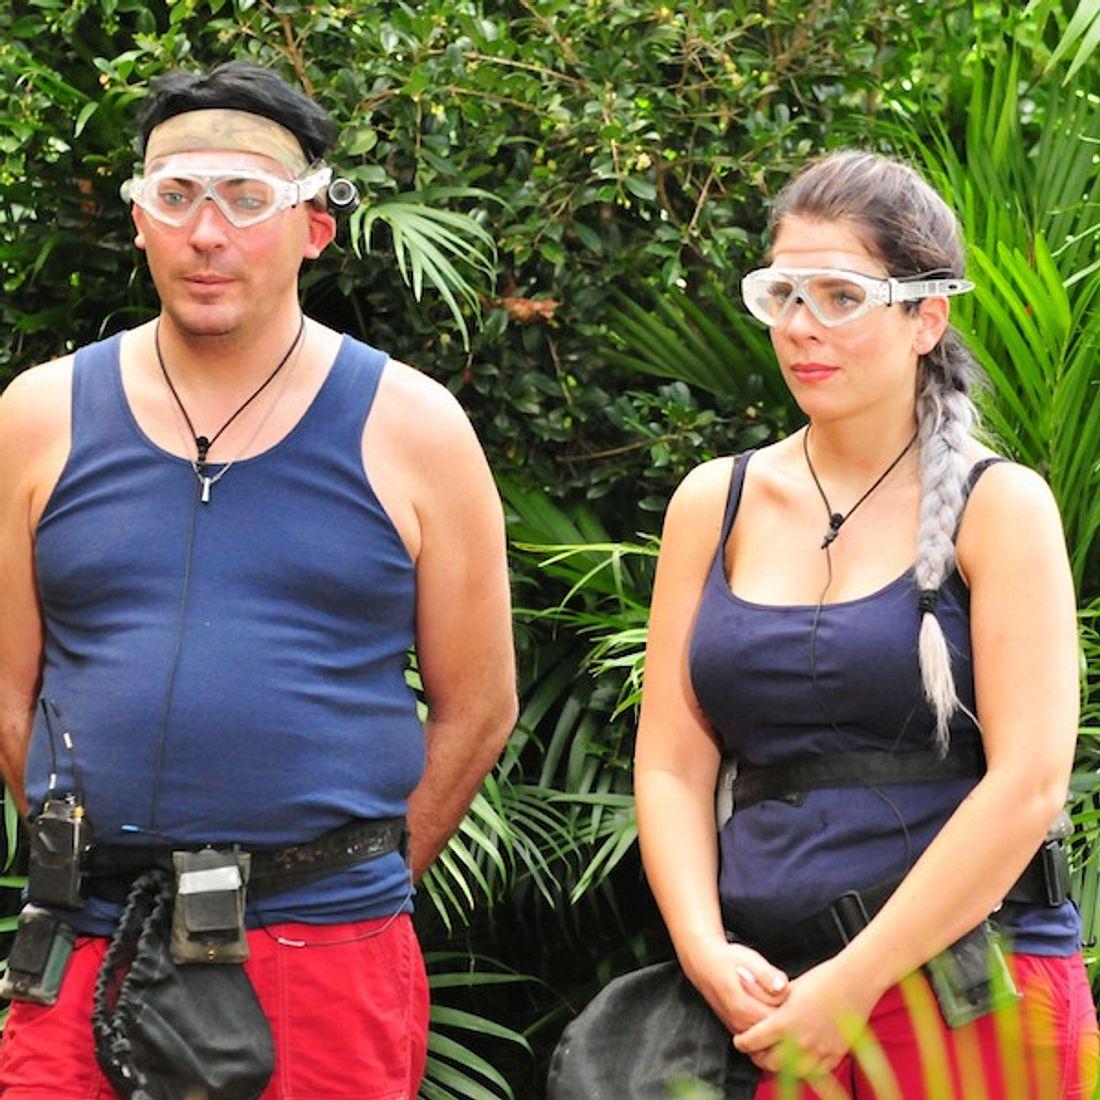 Dschungelcamp: Matthias Mangiapane ätzt gegen Jenny Frankhauser